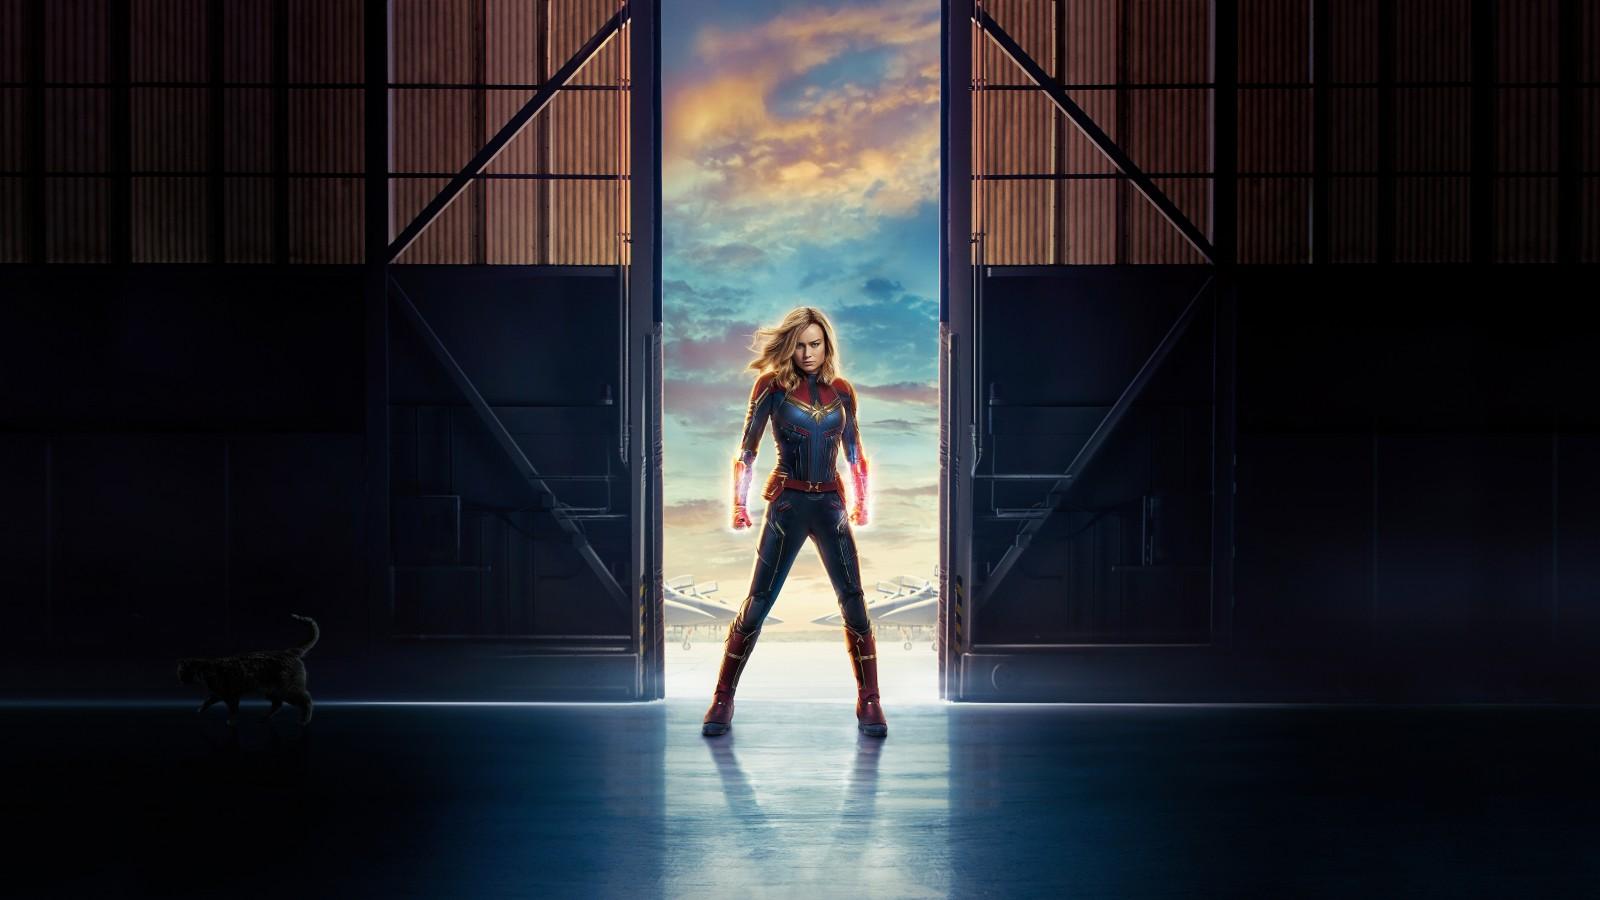 3d Wallpaper Pc Windows 7 Captain Marvel 2019 4k 8k Wallpapers Hd Wallpapers Id